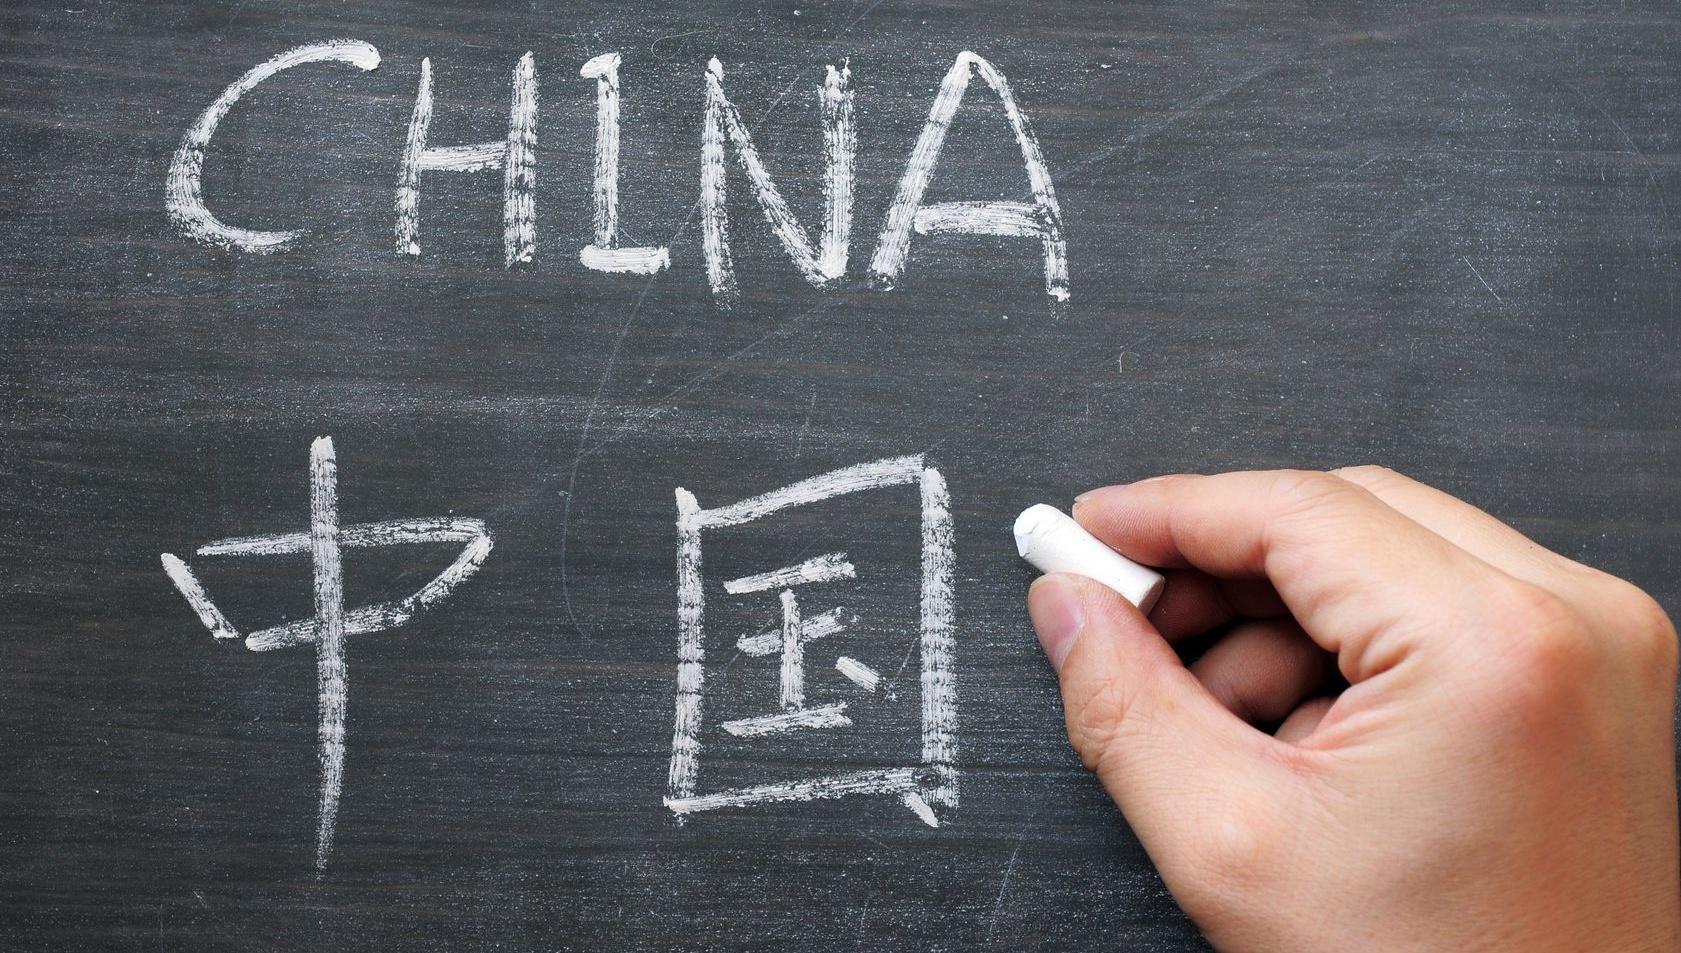 chinese-chalkboard.jpg